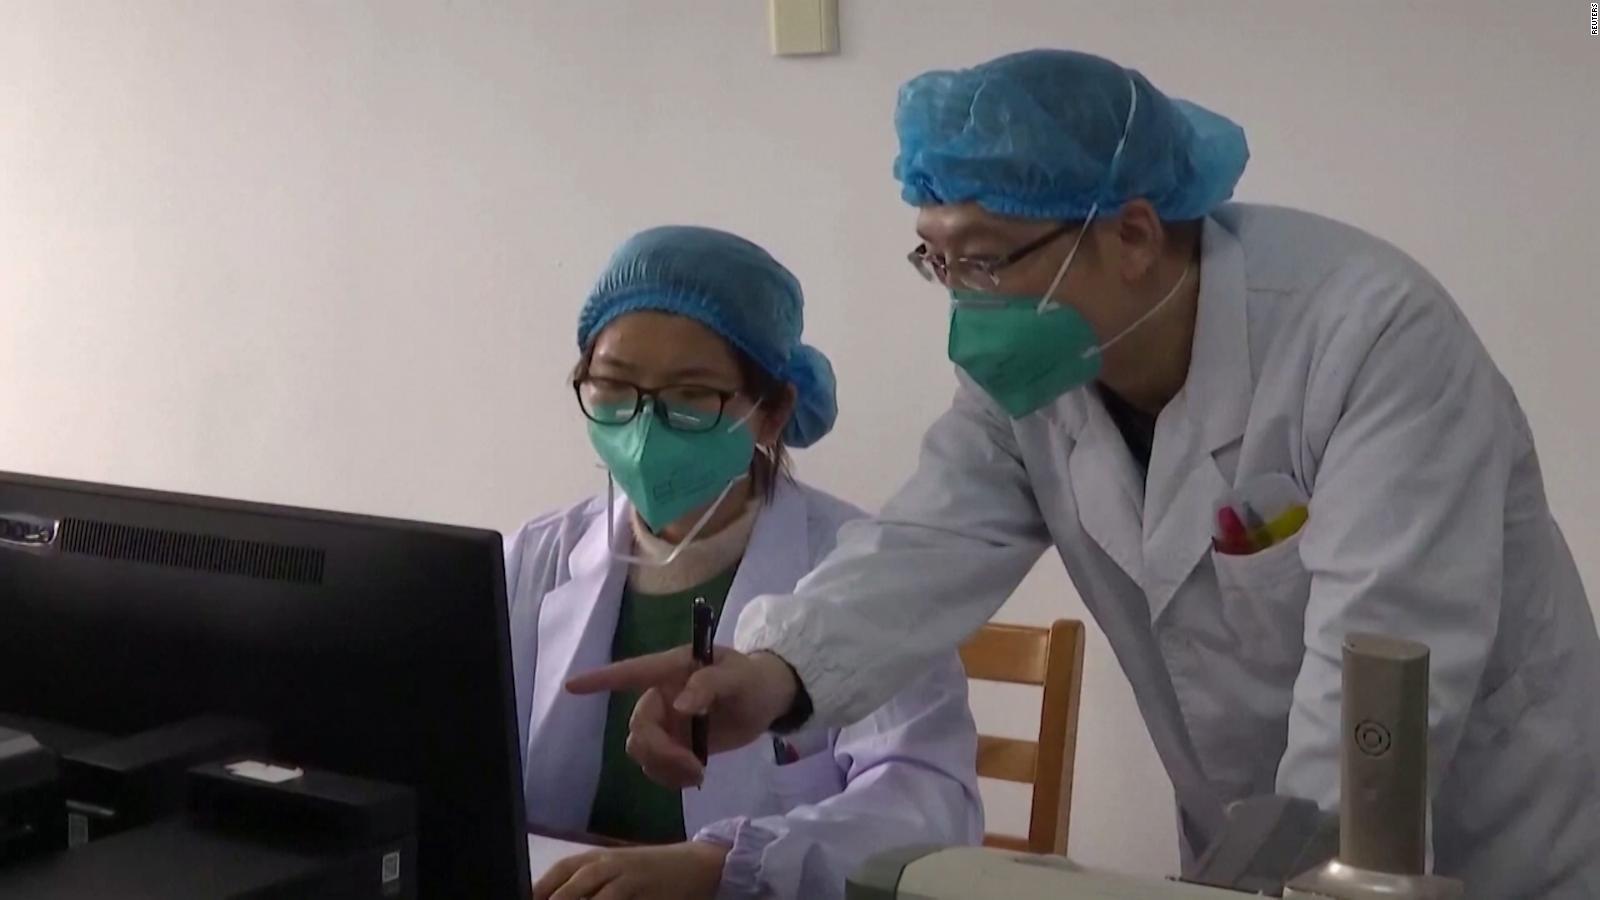 North Korea and coronavirus: Why no cases? - CNN